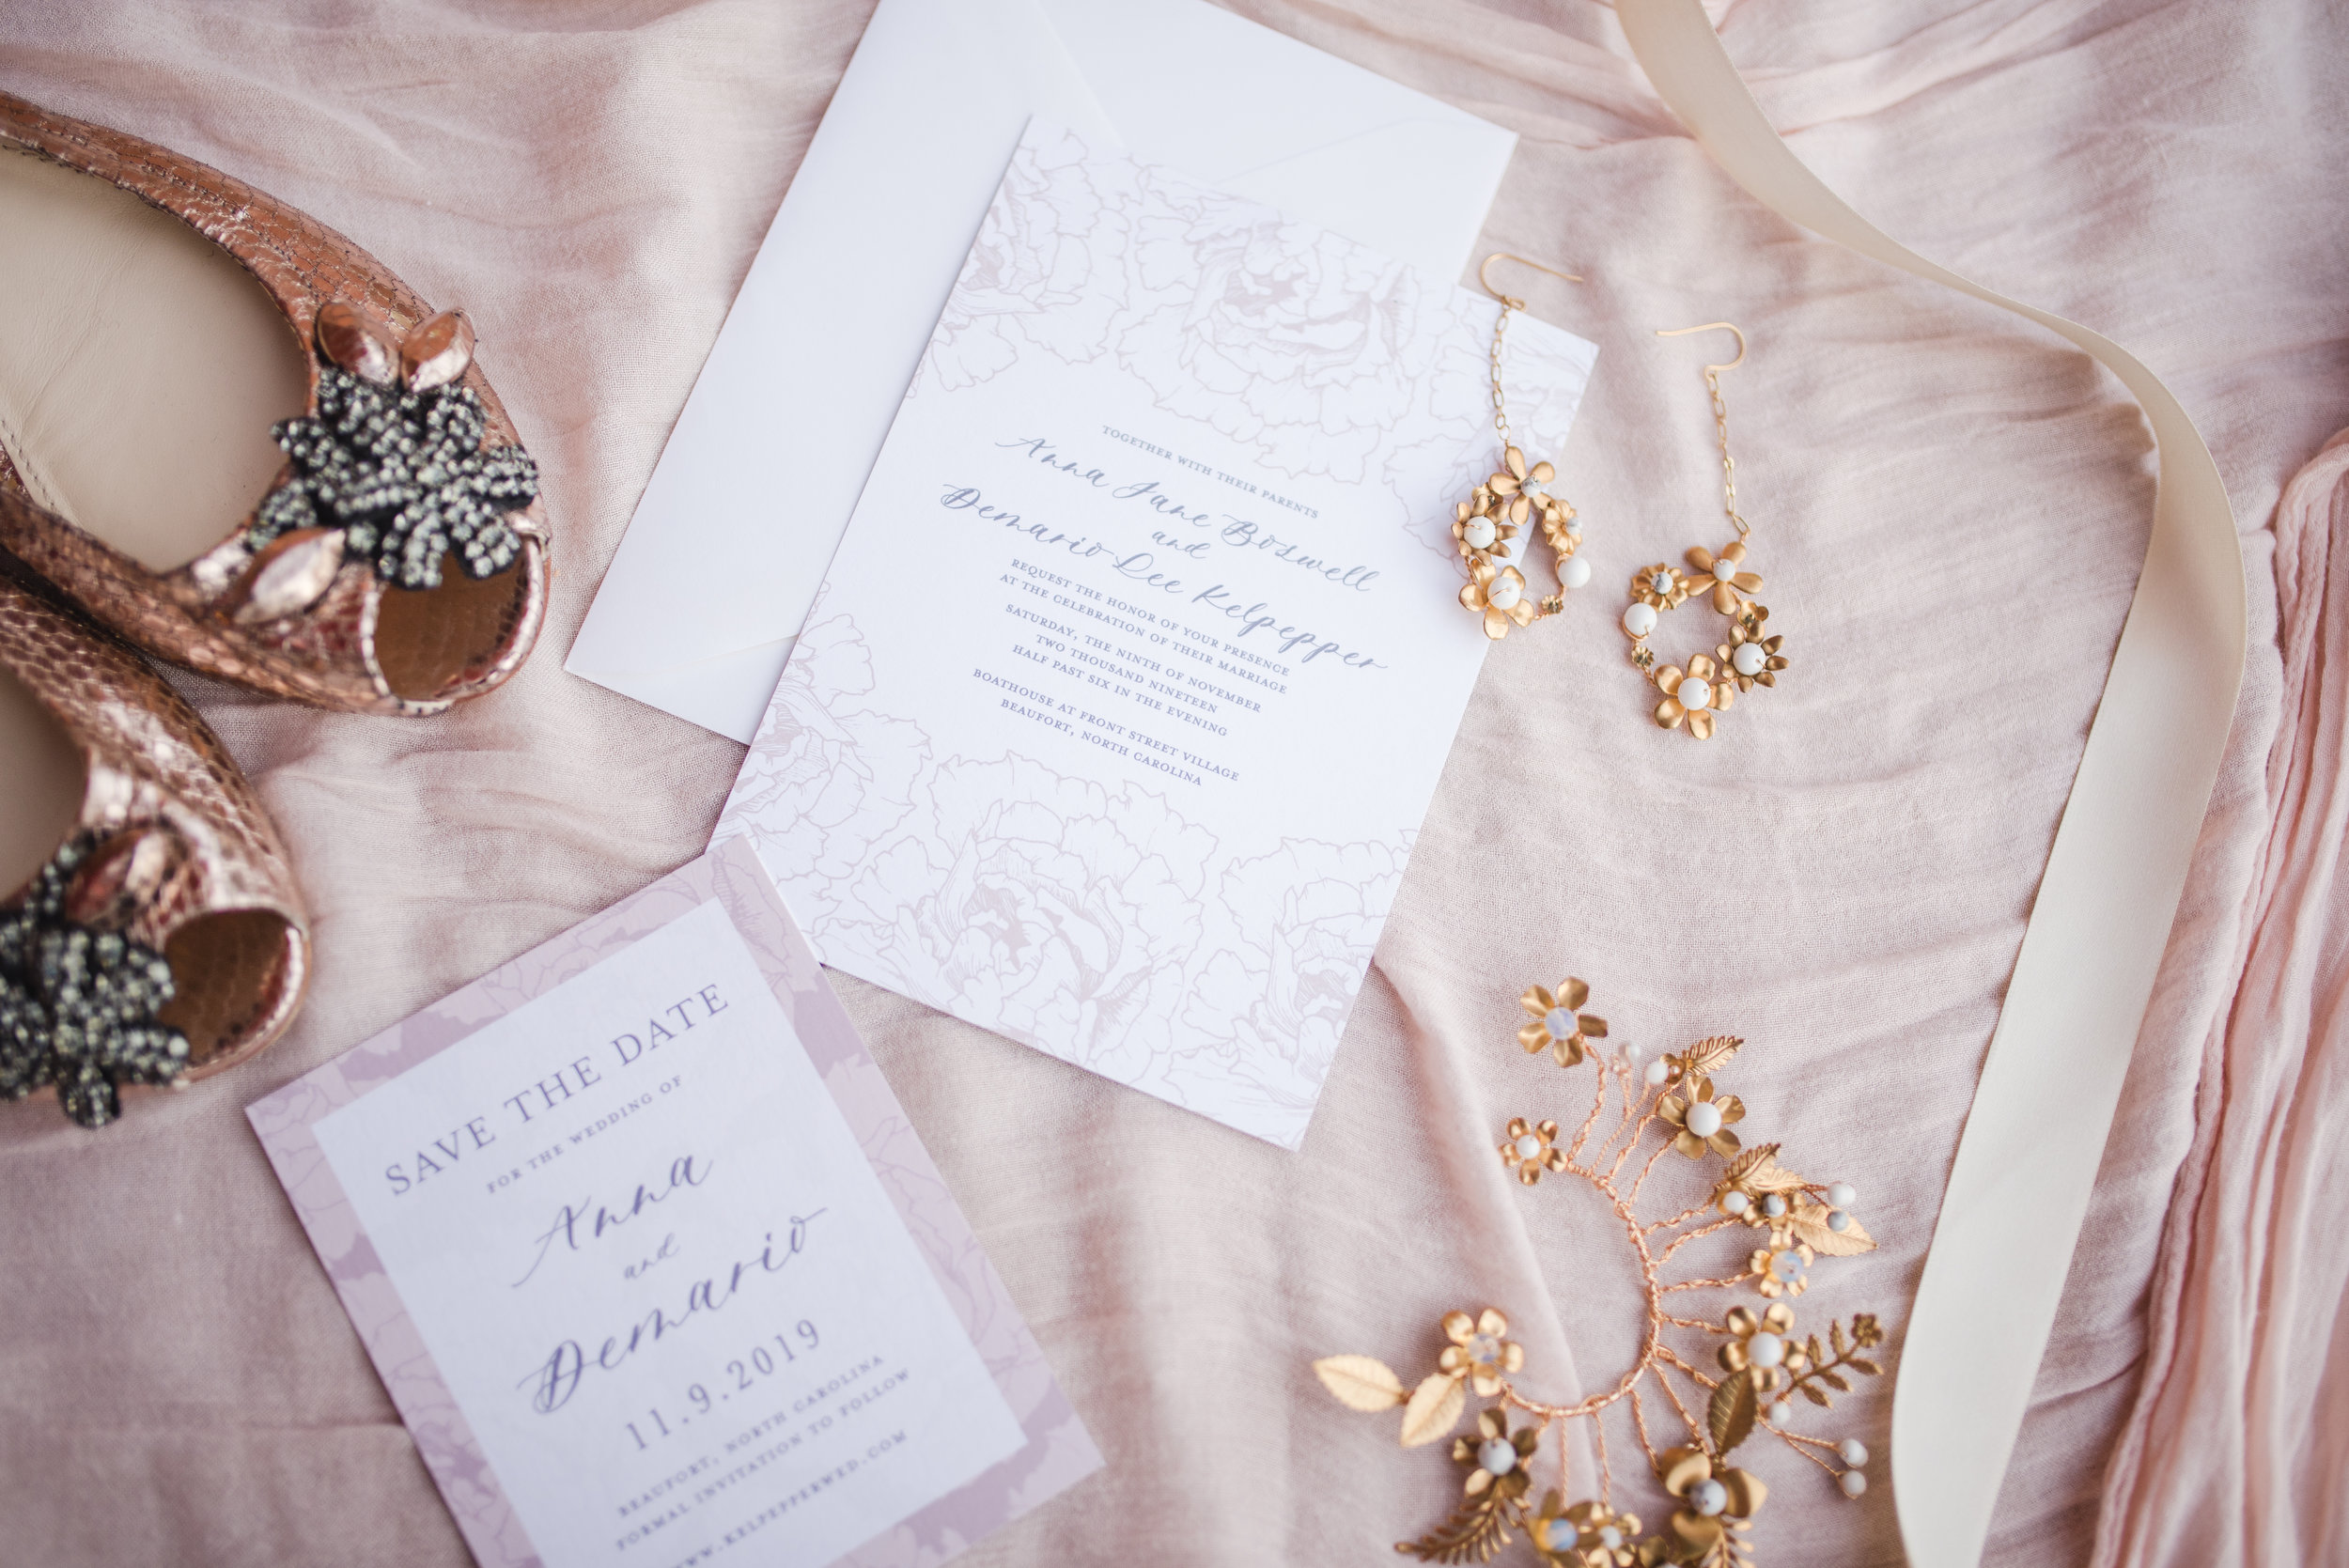 Anna Hand Drawn Wedding Invitation Pink Peonies Feathered Heart PrintsButterfly Garden (15 of 187).jpg